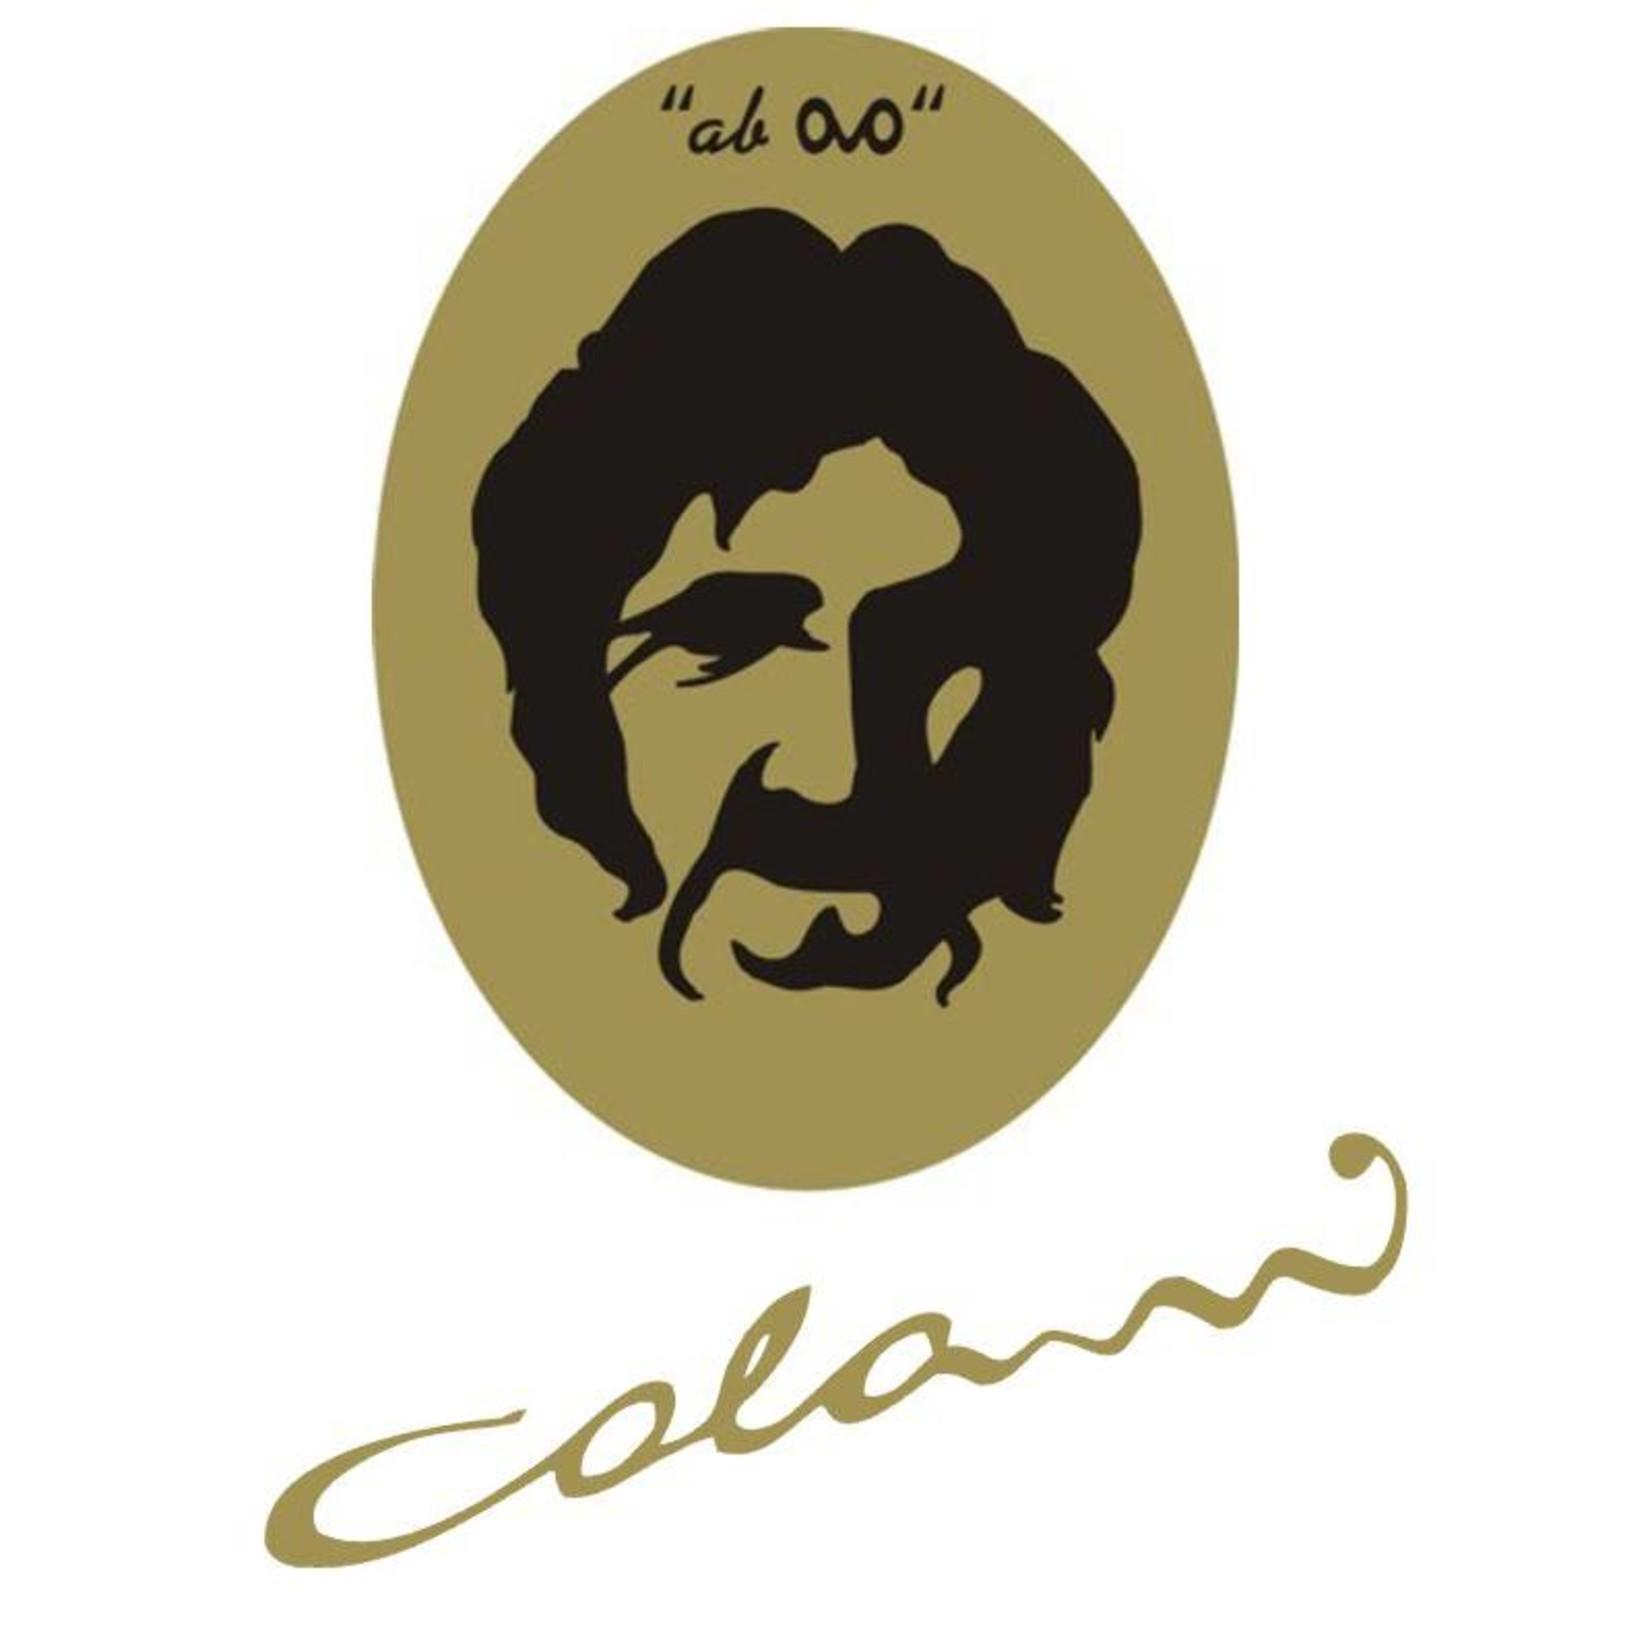 Colani Porzellanserie Colani Espressotasse, groß | Tasse inkl. Unterteller | orange